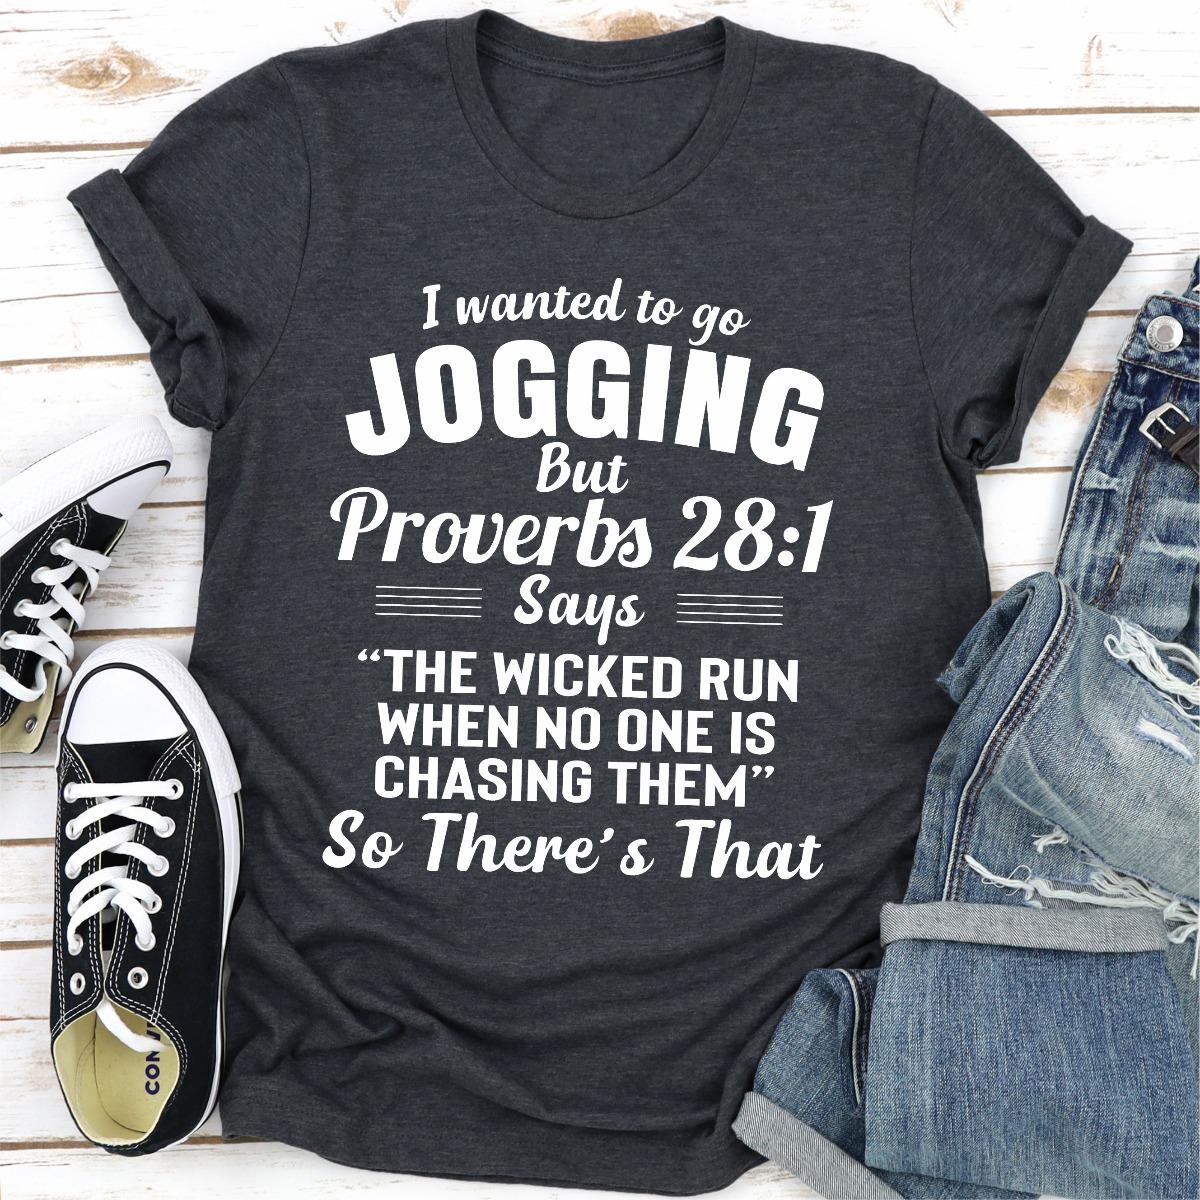 I Wanted To Go Jogging (Dark Heather / Xl)